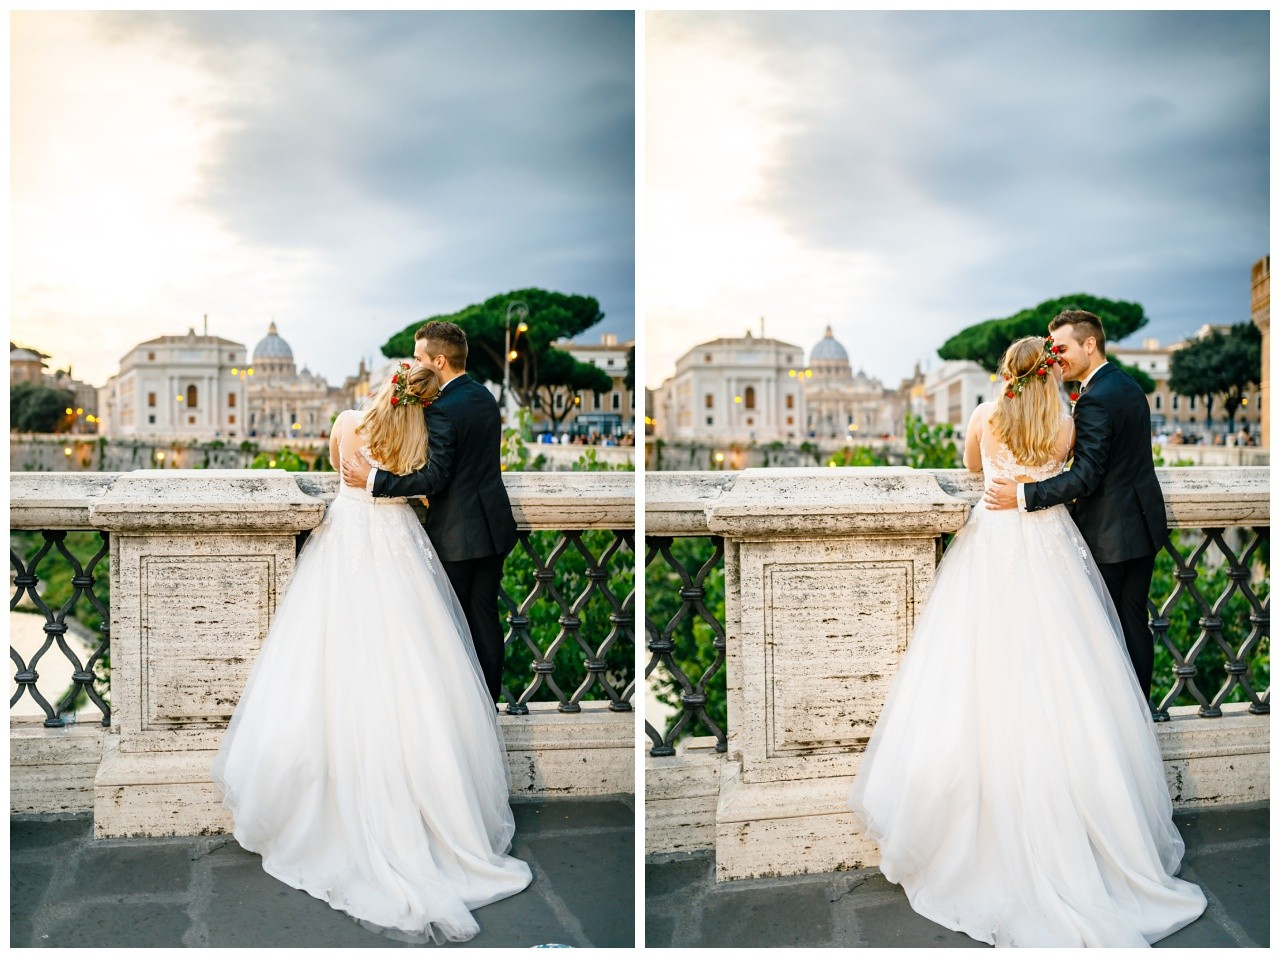 Hochzeitsfotos Rom After Wedding Shooting Hochzeitsfotograf Italien 16 - After Wedding Shooting in Rom